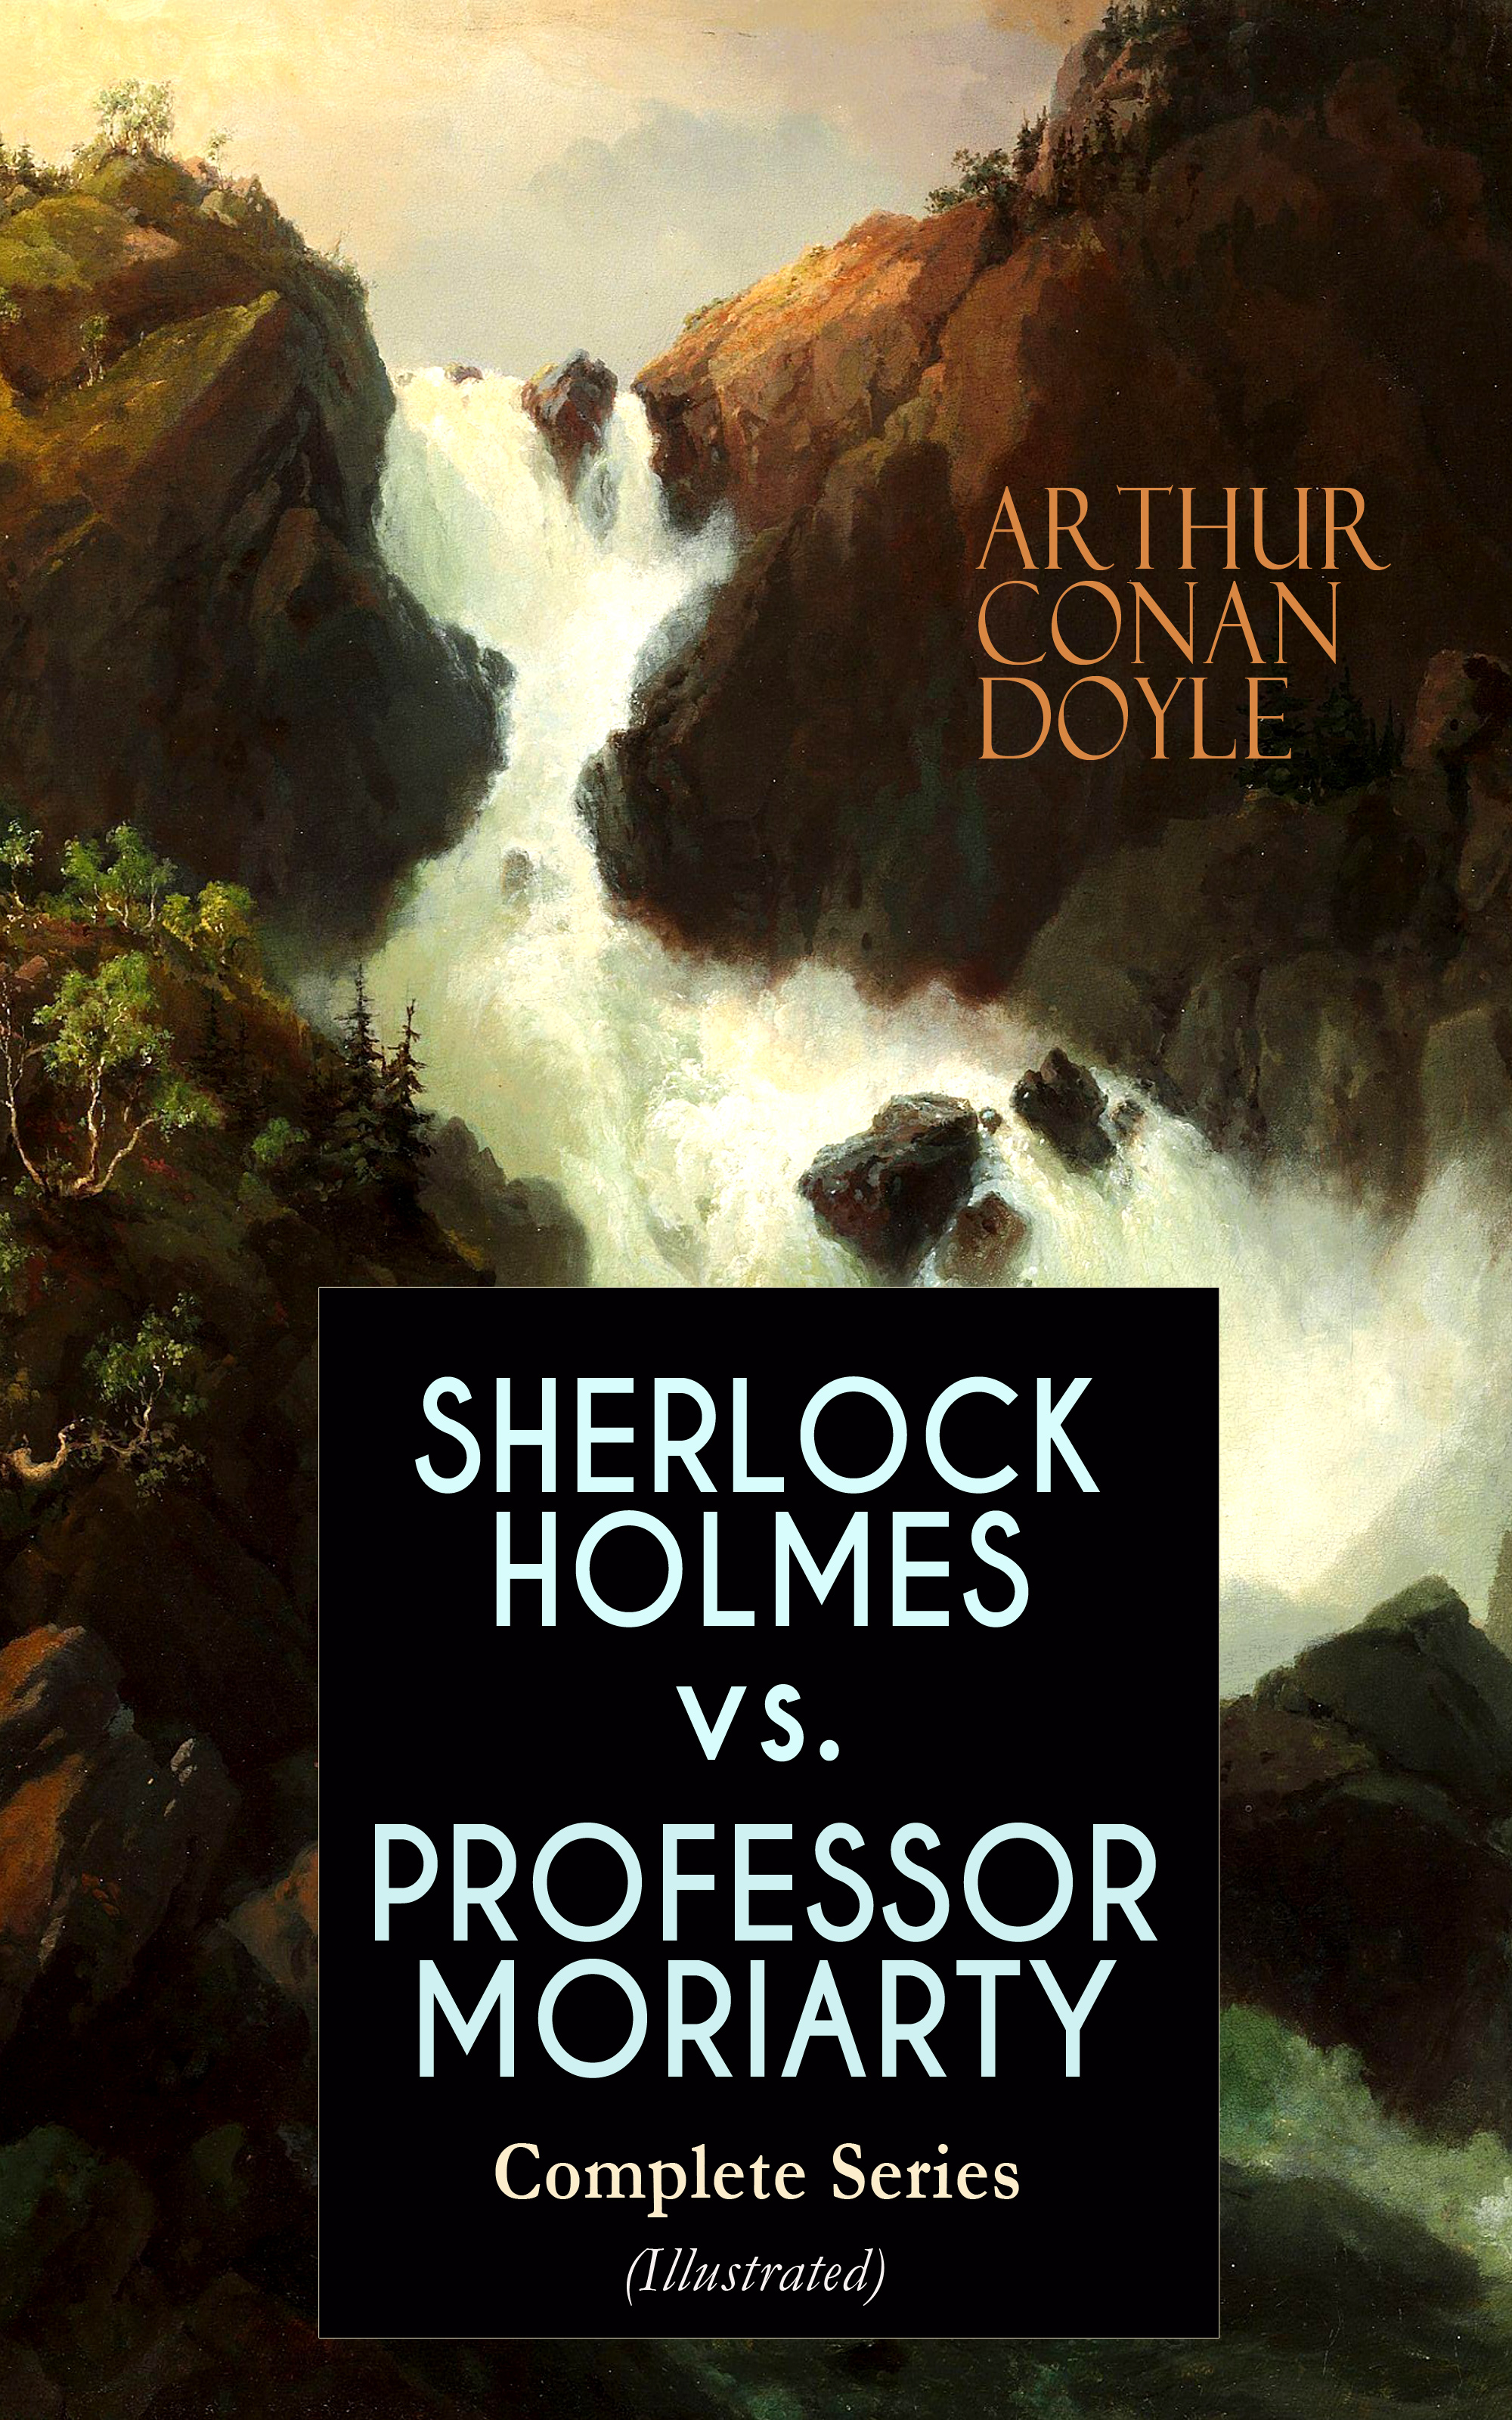 sherlock holmes vs professor moriarty complete series illustrated